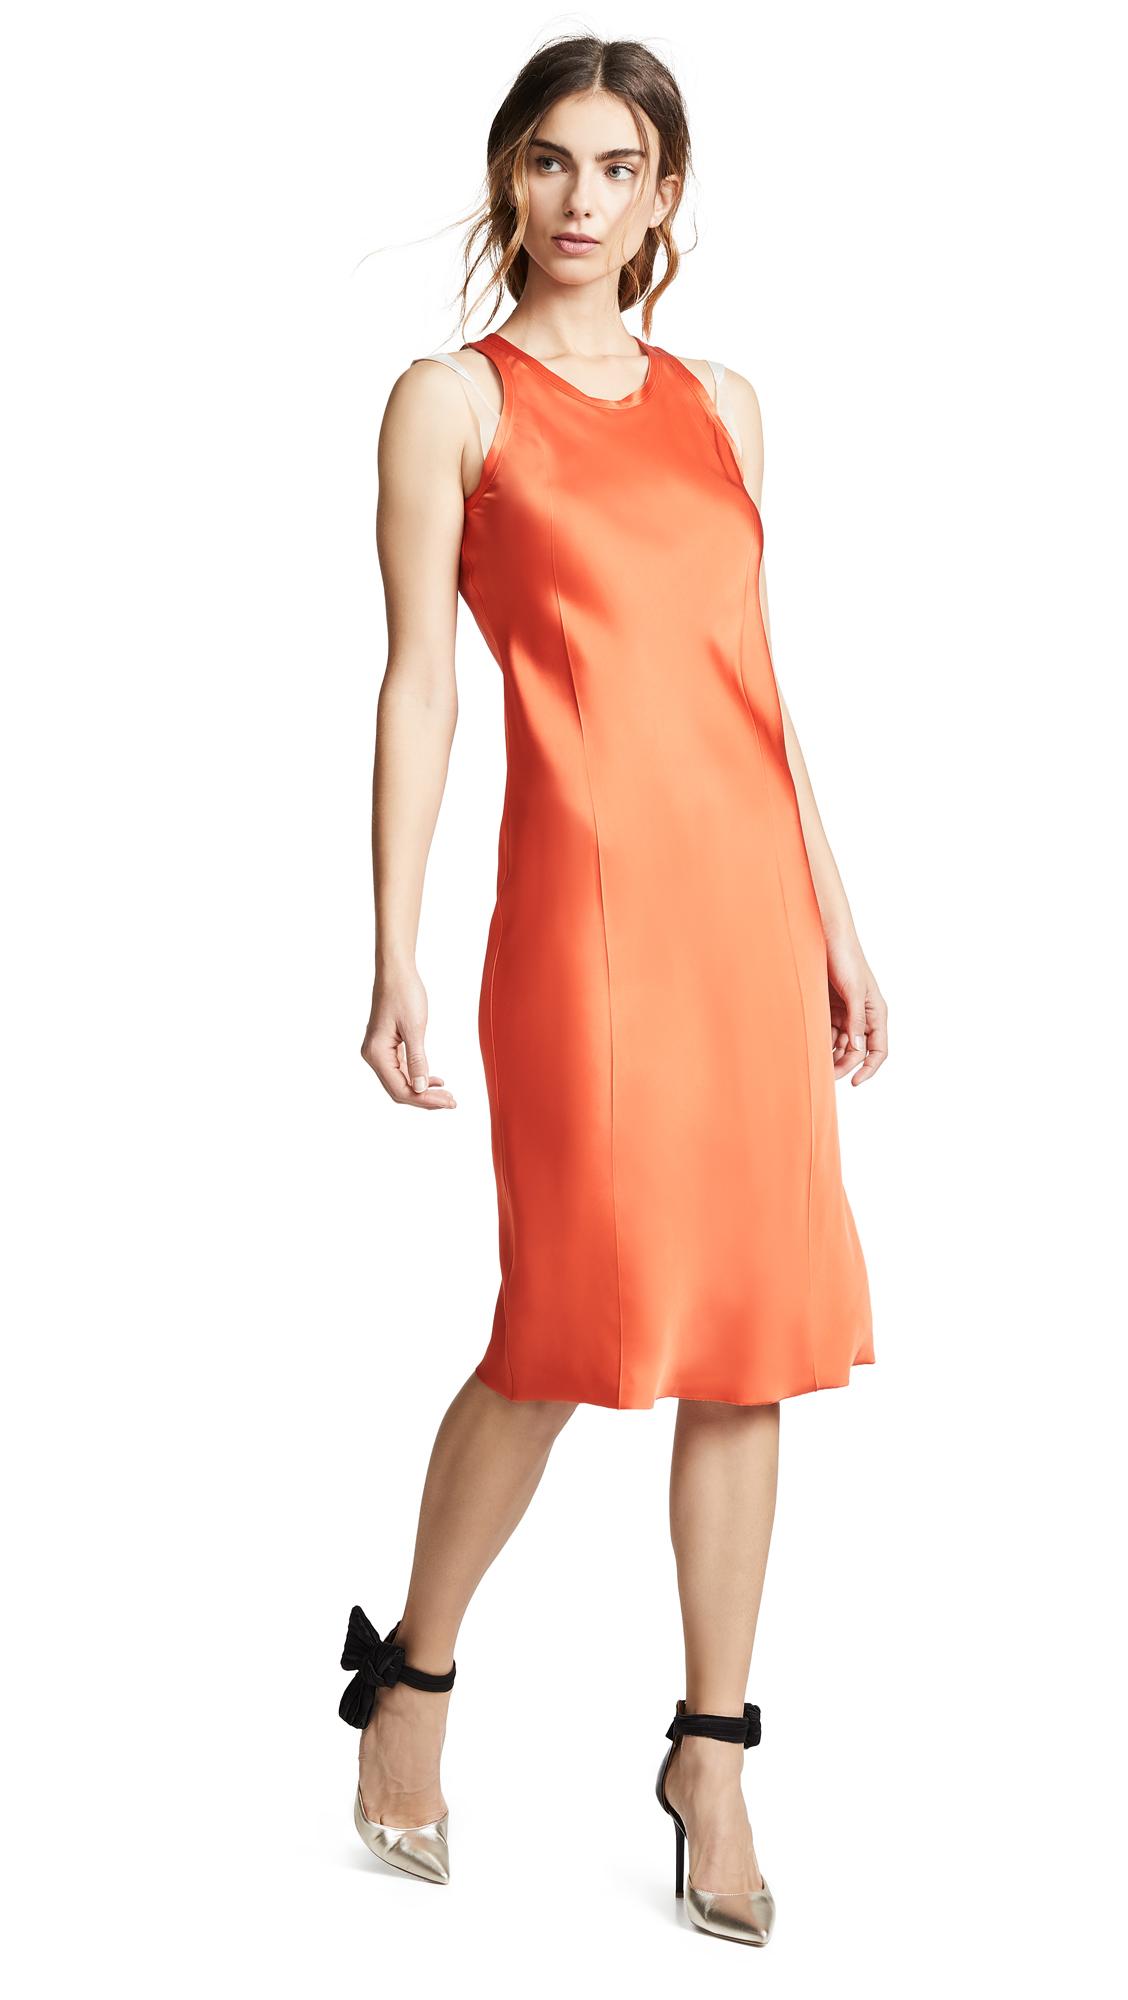 Helmut Lang Bra Strap Tank Dress - Magma